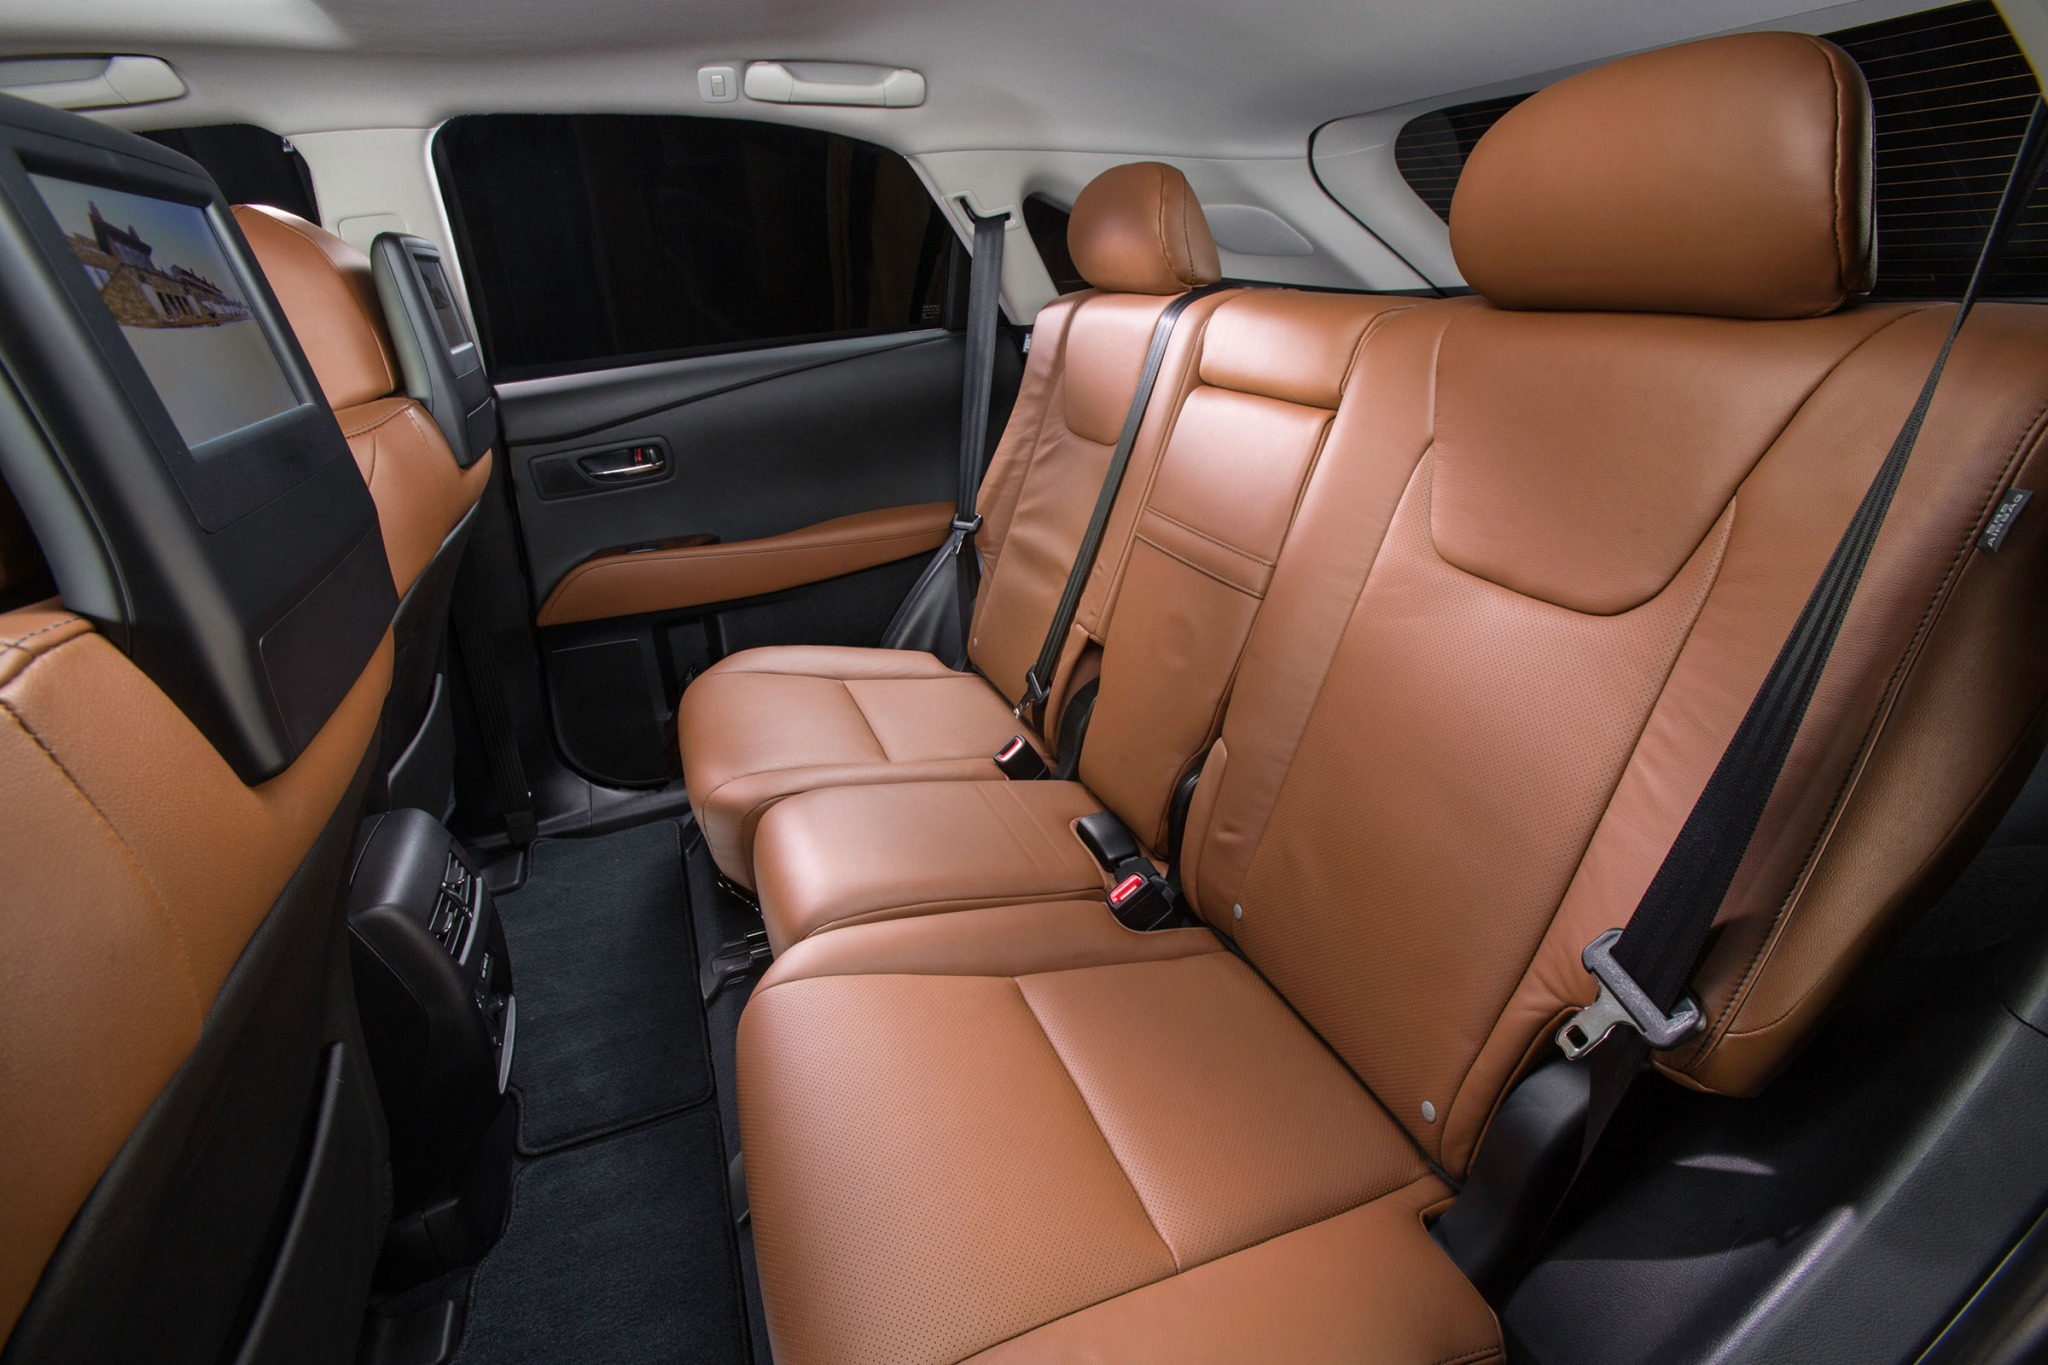 ... 2015 Lexus RX 350 4dr SUV Interior #8